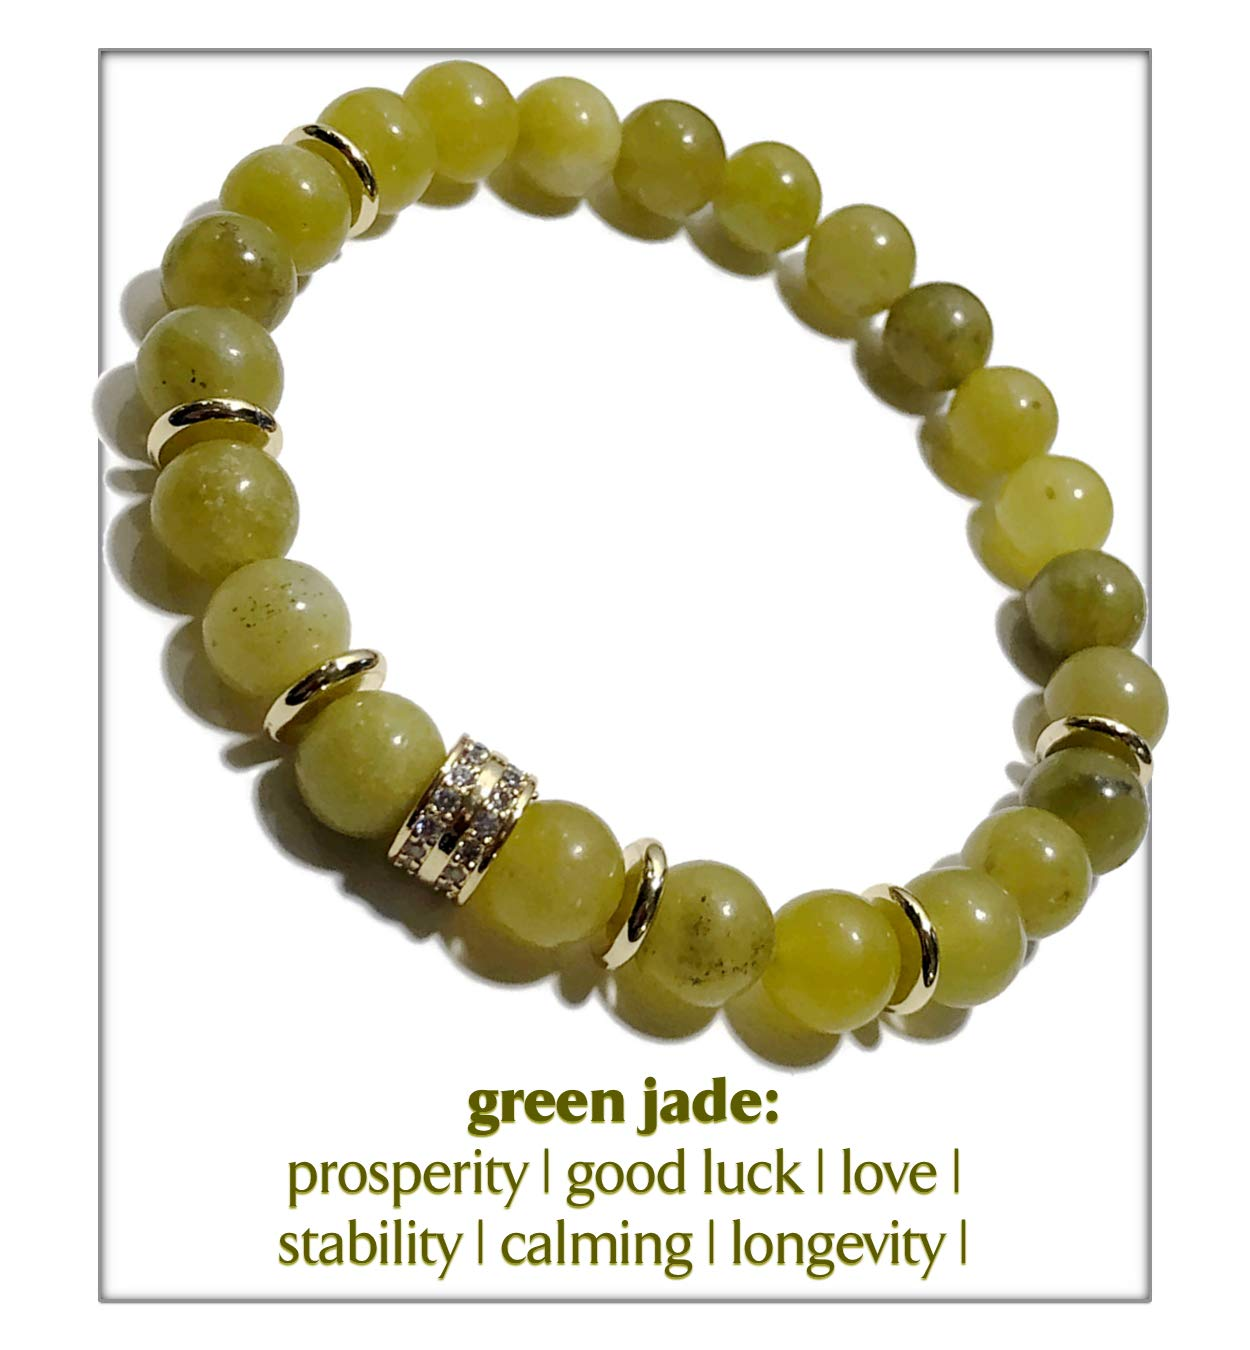 KarmaArm Love Bracelet | Success | Green Jade | Chakra Yoga Reiki Healing Energy Meditation Zen Jewelry | Wellness Self-Care Mala Wristband | CZ Diamond Pave (6.5)